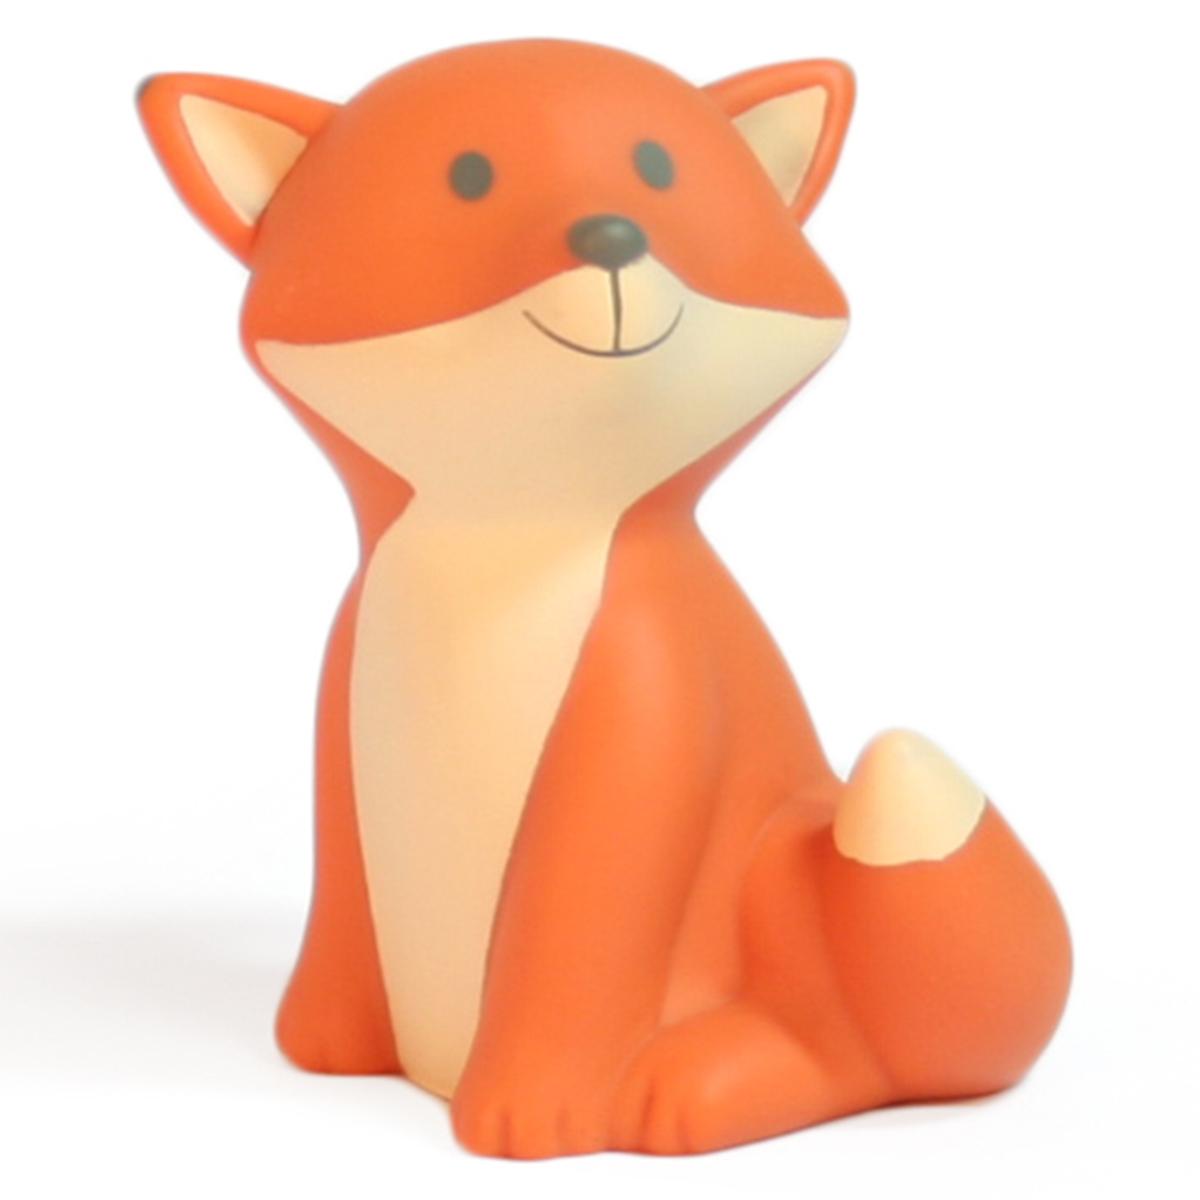 Tirelire Tirelire César Petit Modèle - Orange Tirelire César Petit Modèle - Orange